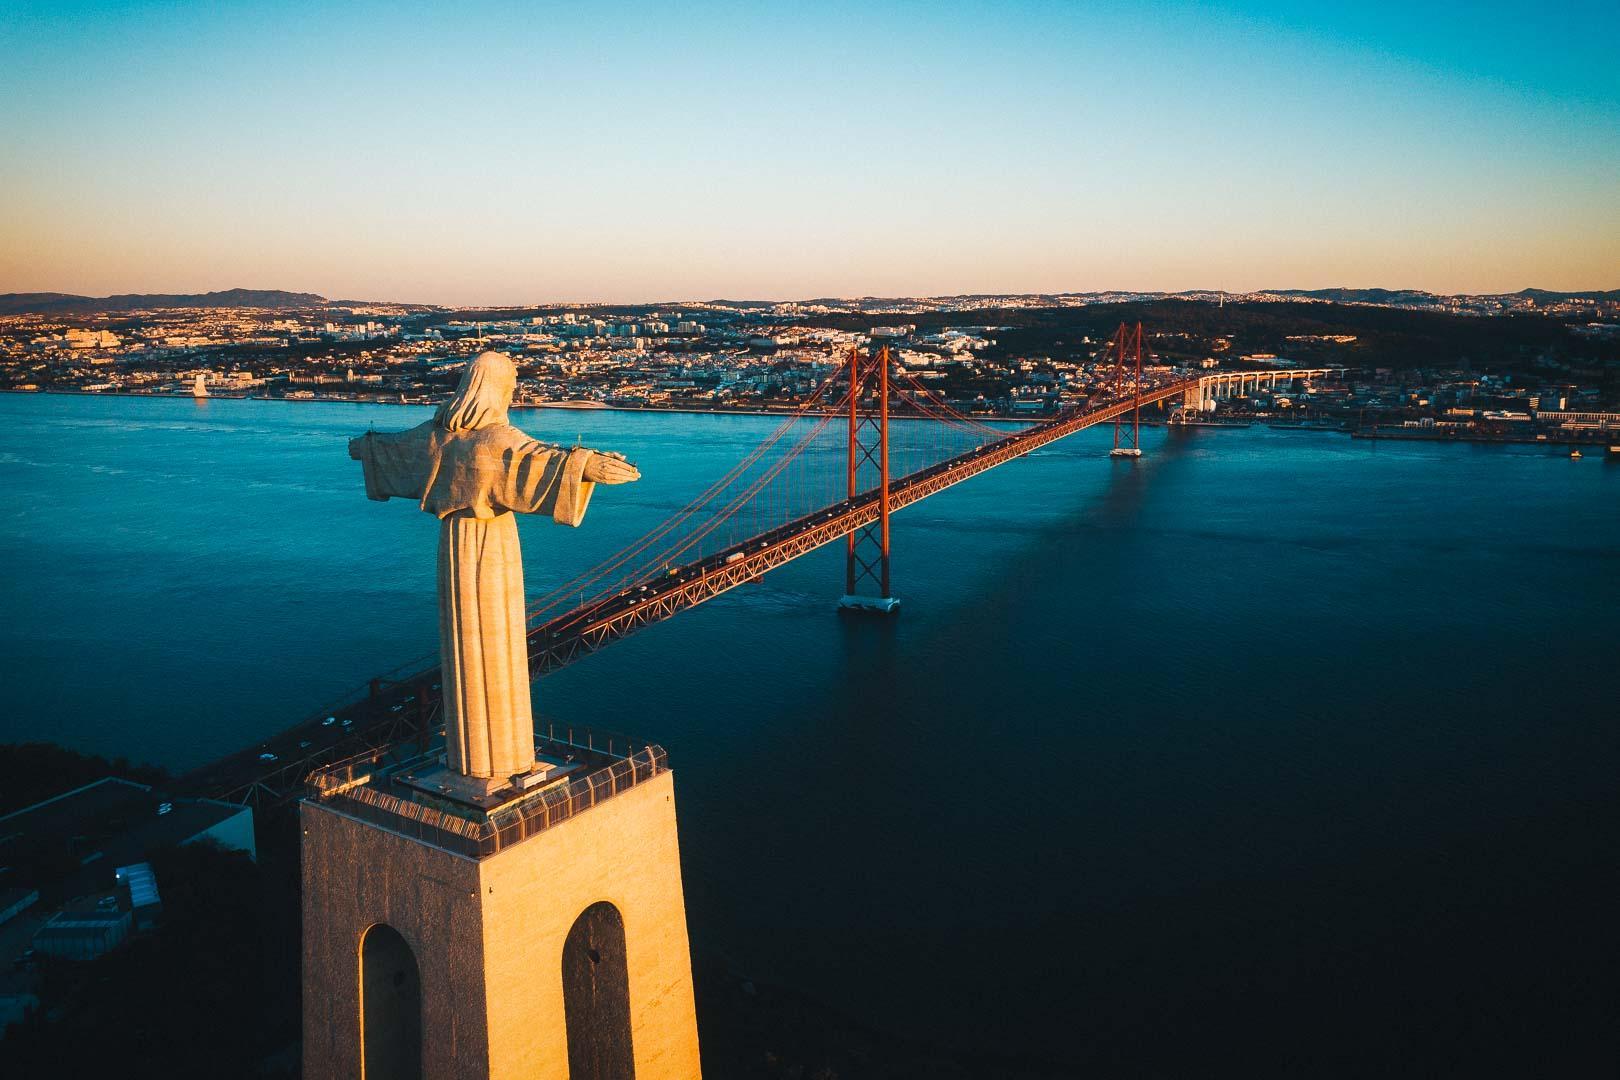 Santuario Nacional de Cristo Rei Lisboa - Visit the Highest Point of Lisbon